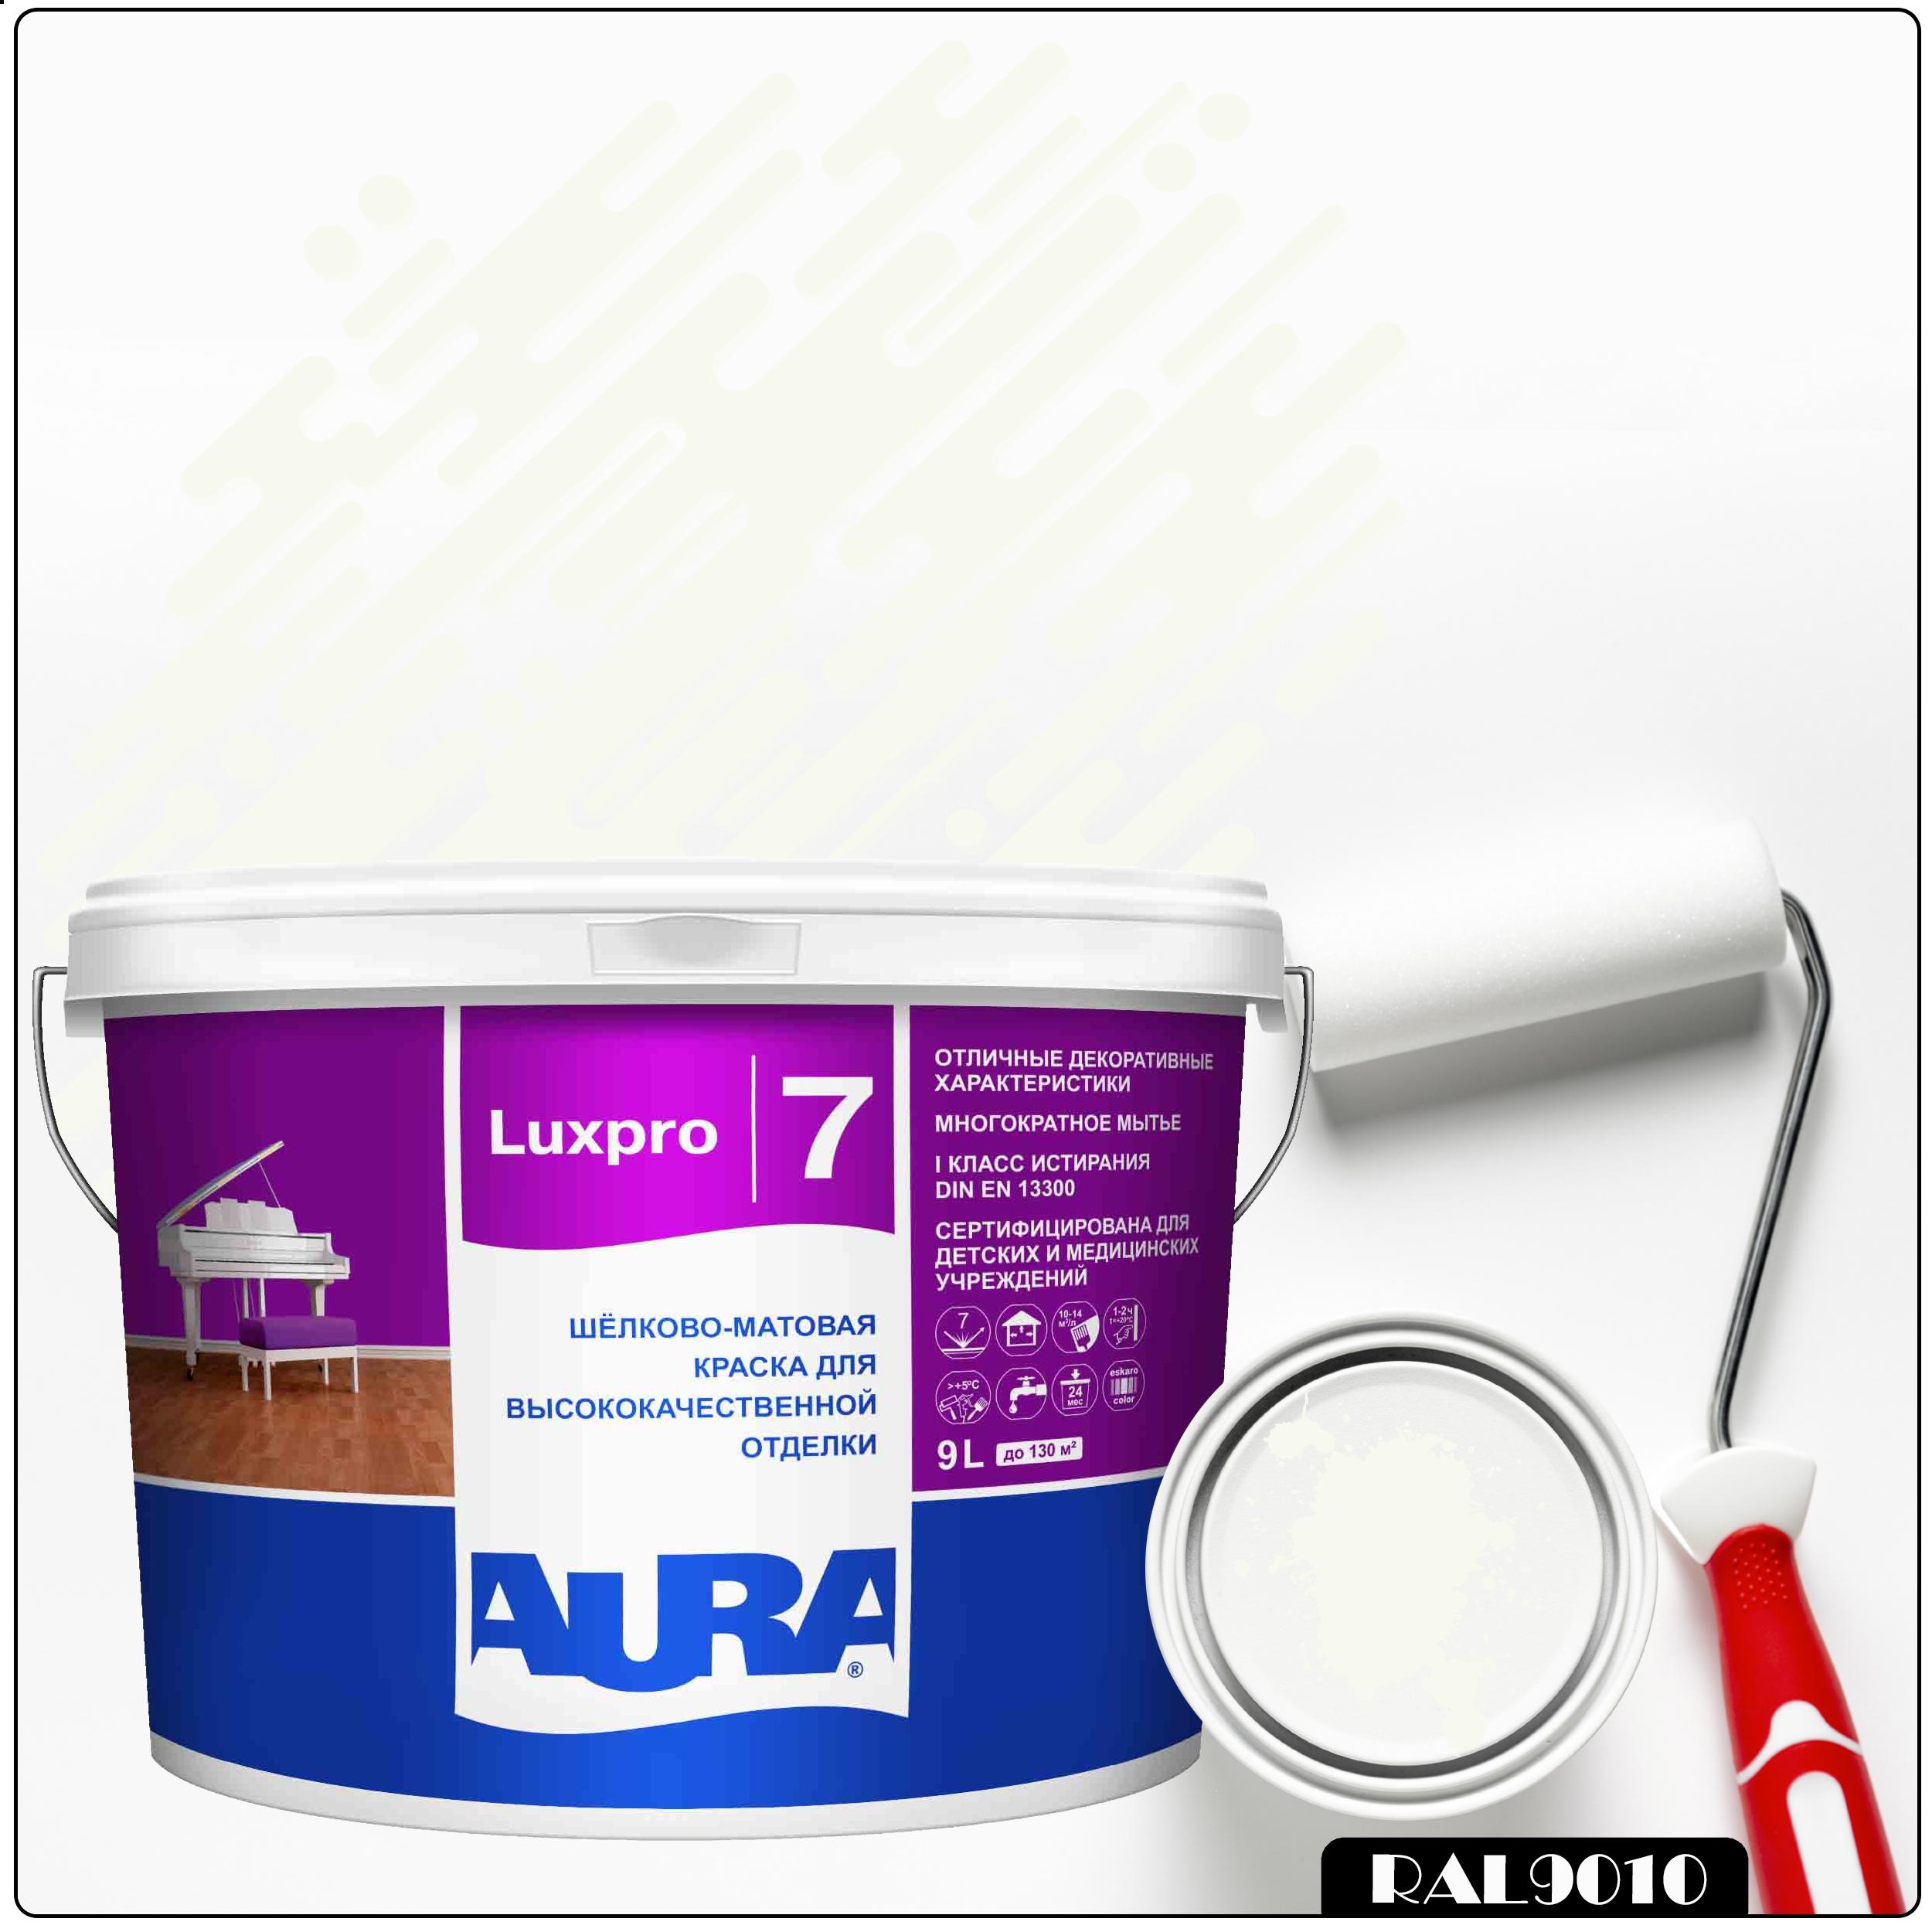 Фото 6 - Краска Aura LuxPRO 7, RAL 9010 Белый, латексная, шелково-матовая, интерьерная, 9л, Аура.